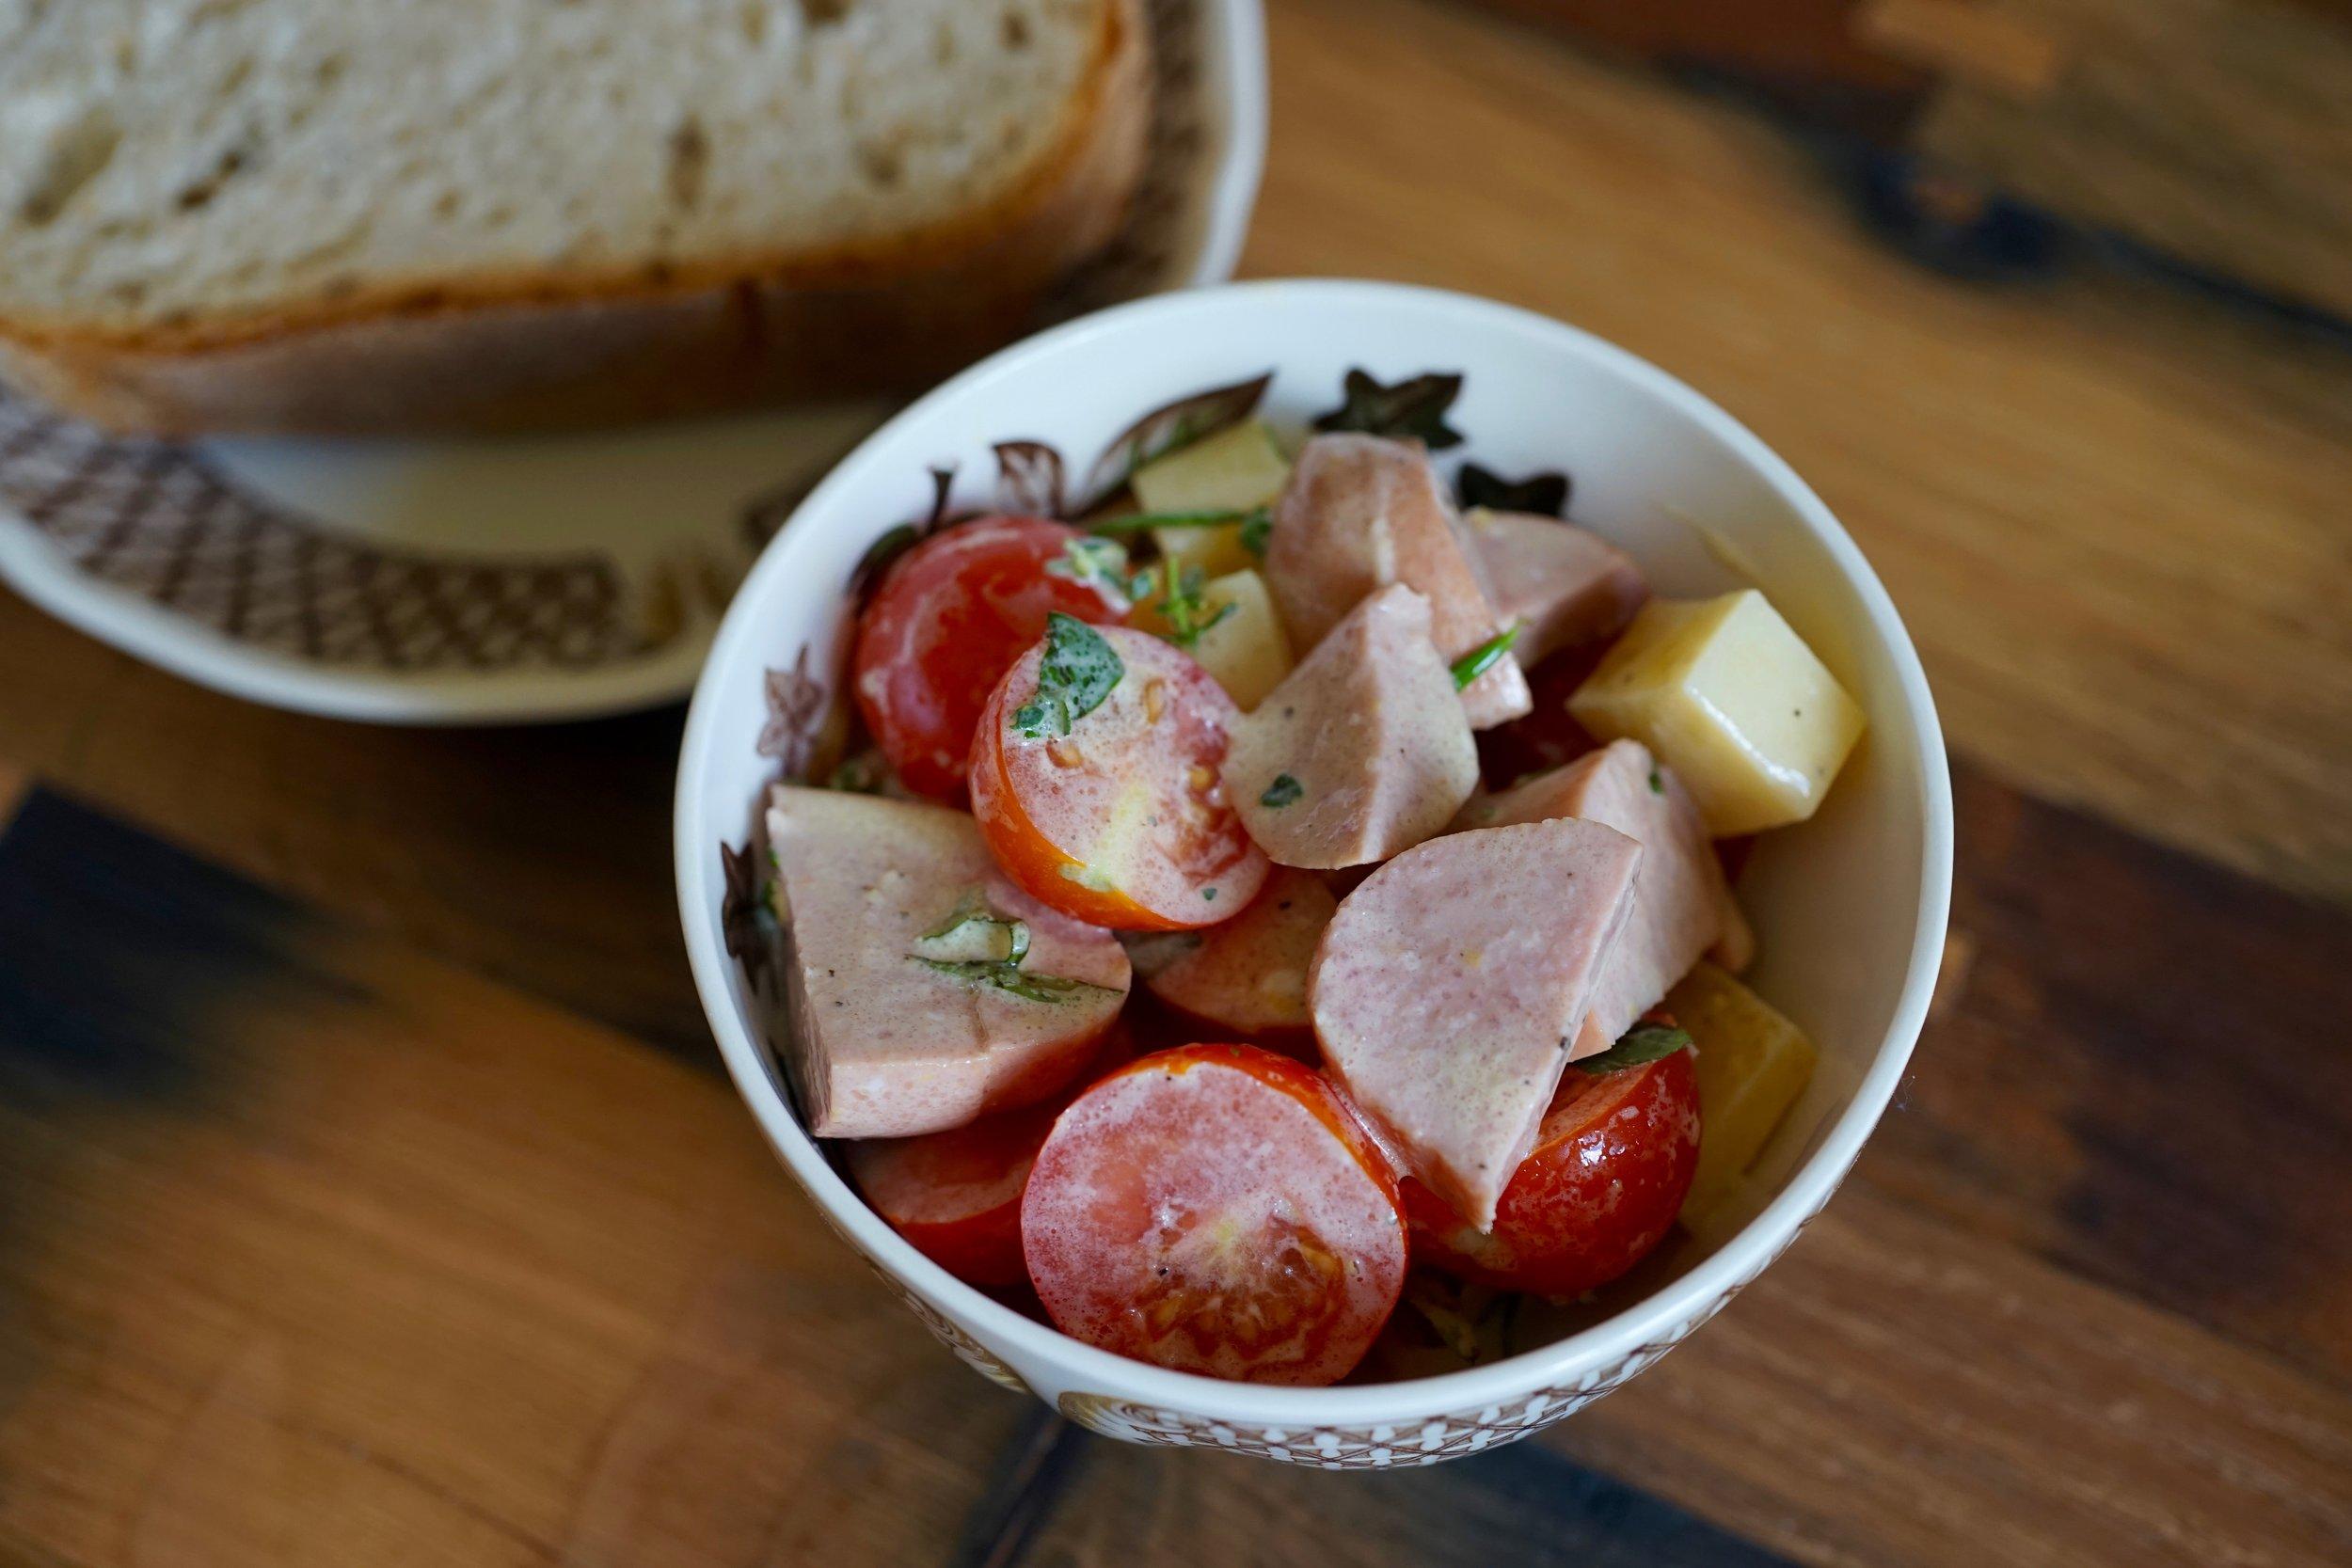 More Wurst? - Cervelat Salat